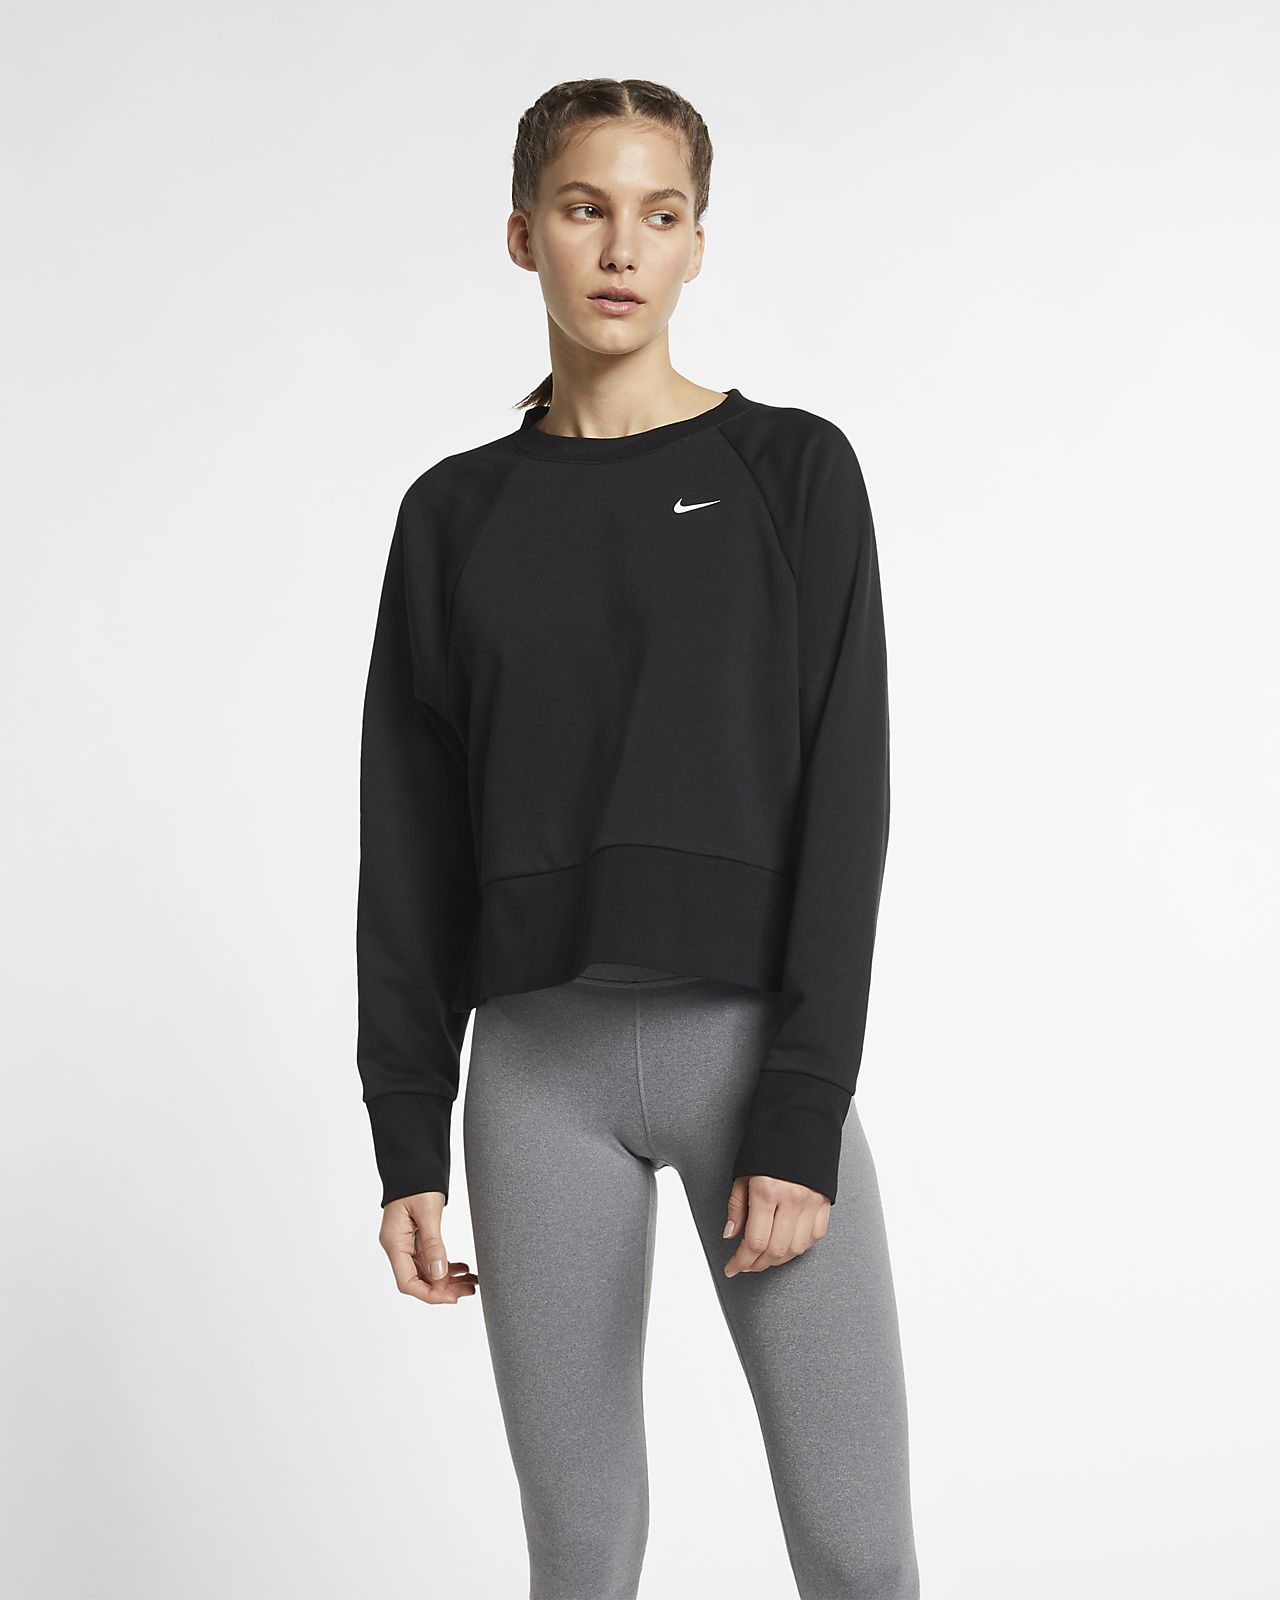 Nike Womens Dry Versa Training Top Clothing